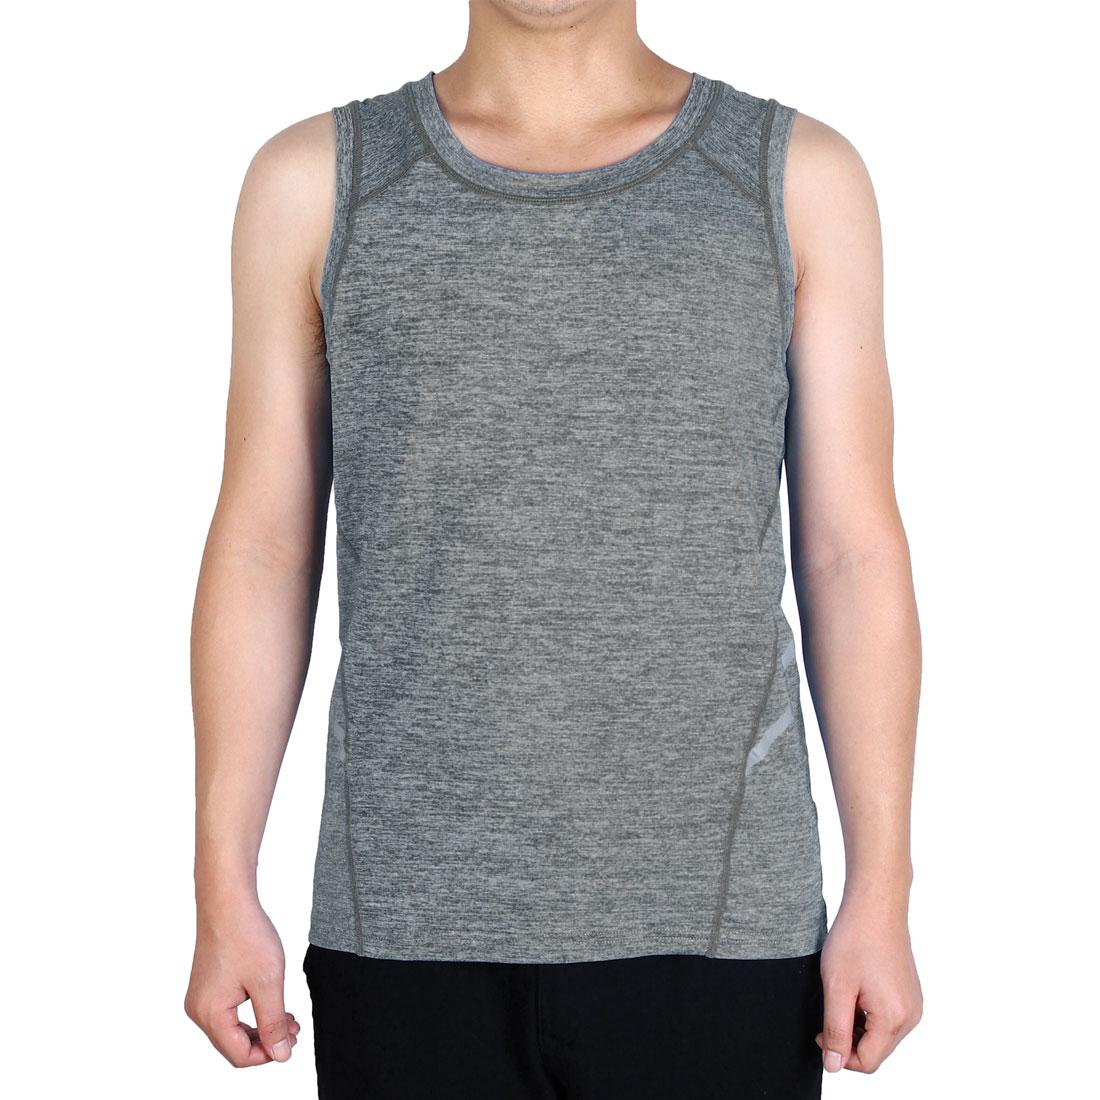 Men Sleeveless T-shirt Activewear Vest Training Exercise Sports Tank Top Gray L